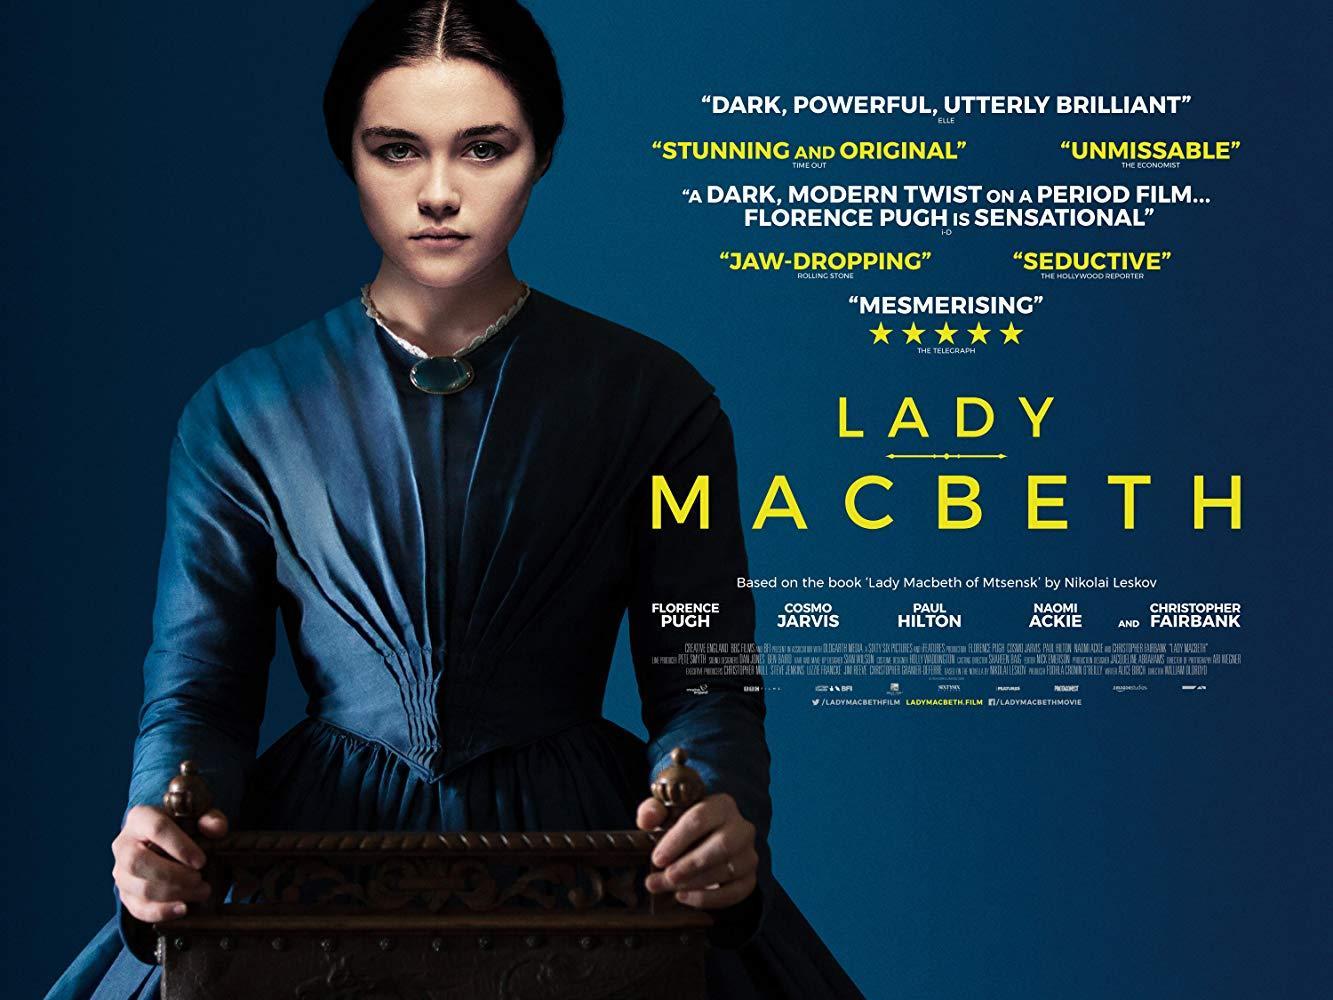 مشاهدة فيلم Lady Macbeth 2017 HD مترجم كامل اون لاين